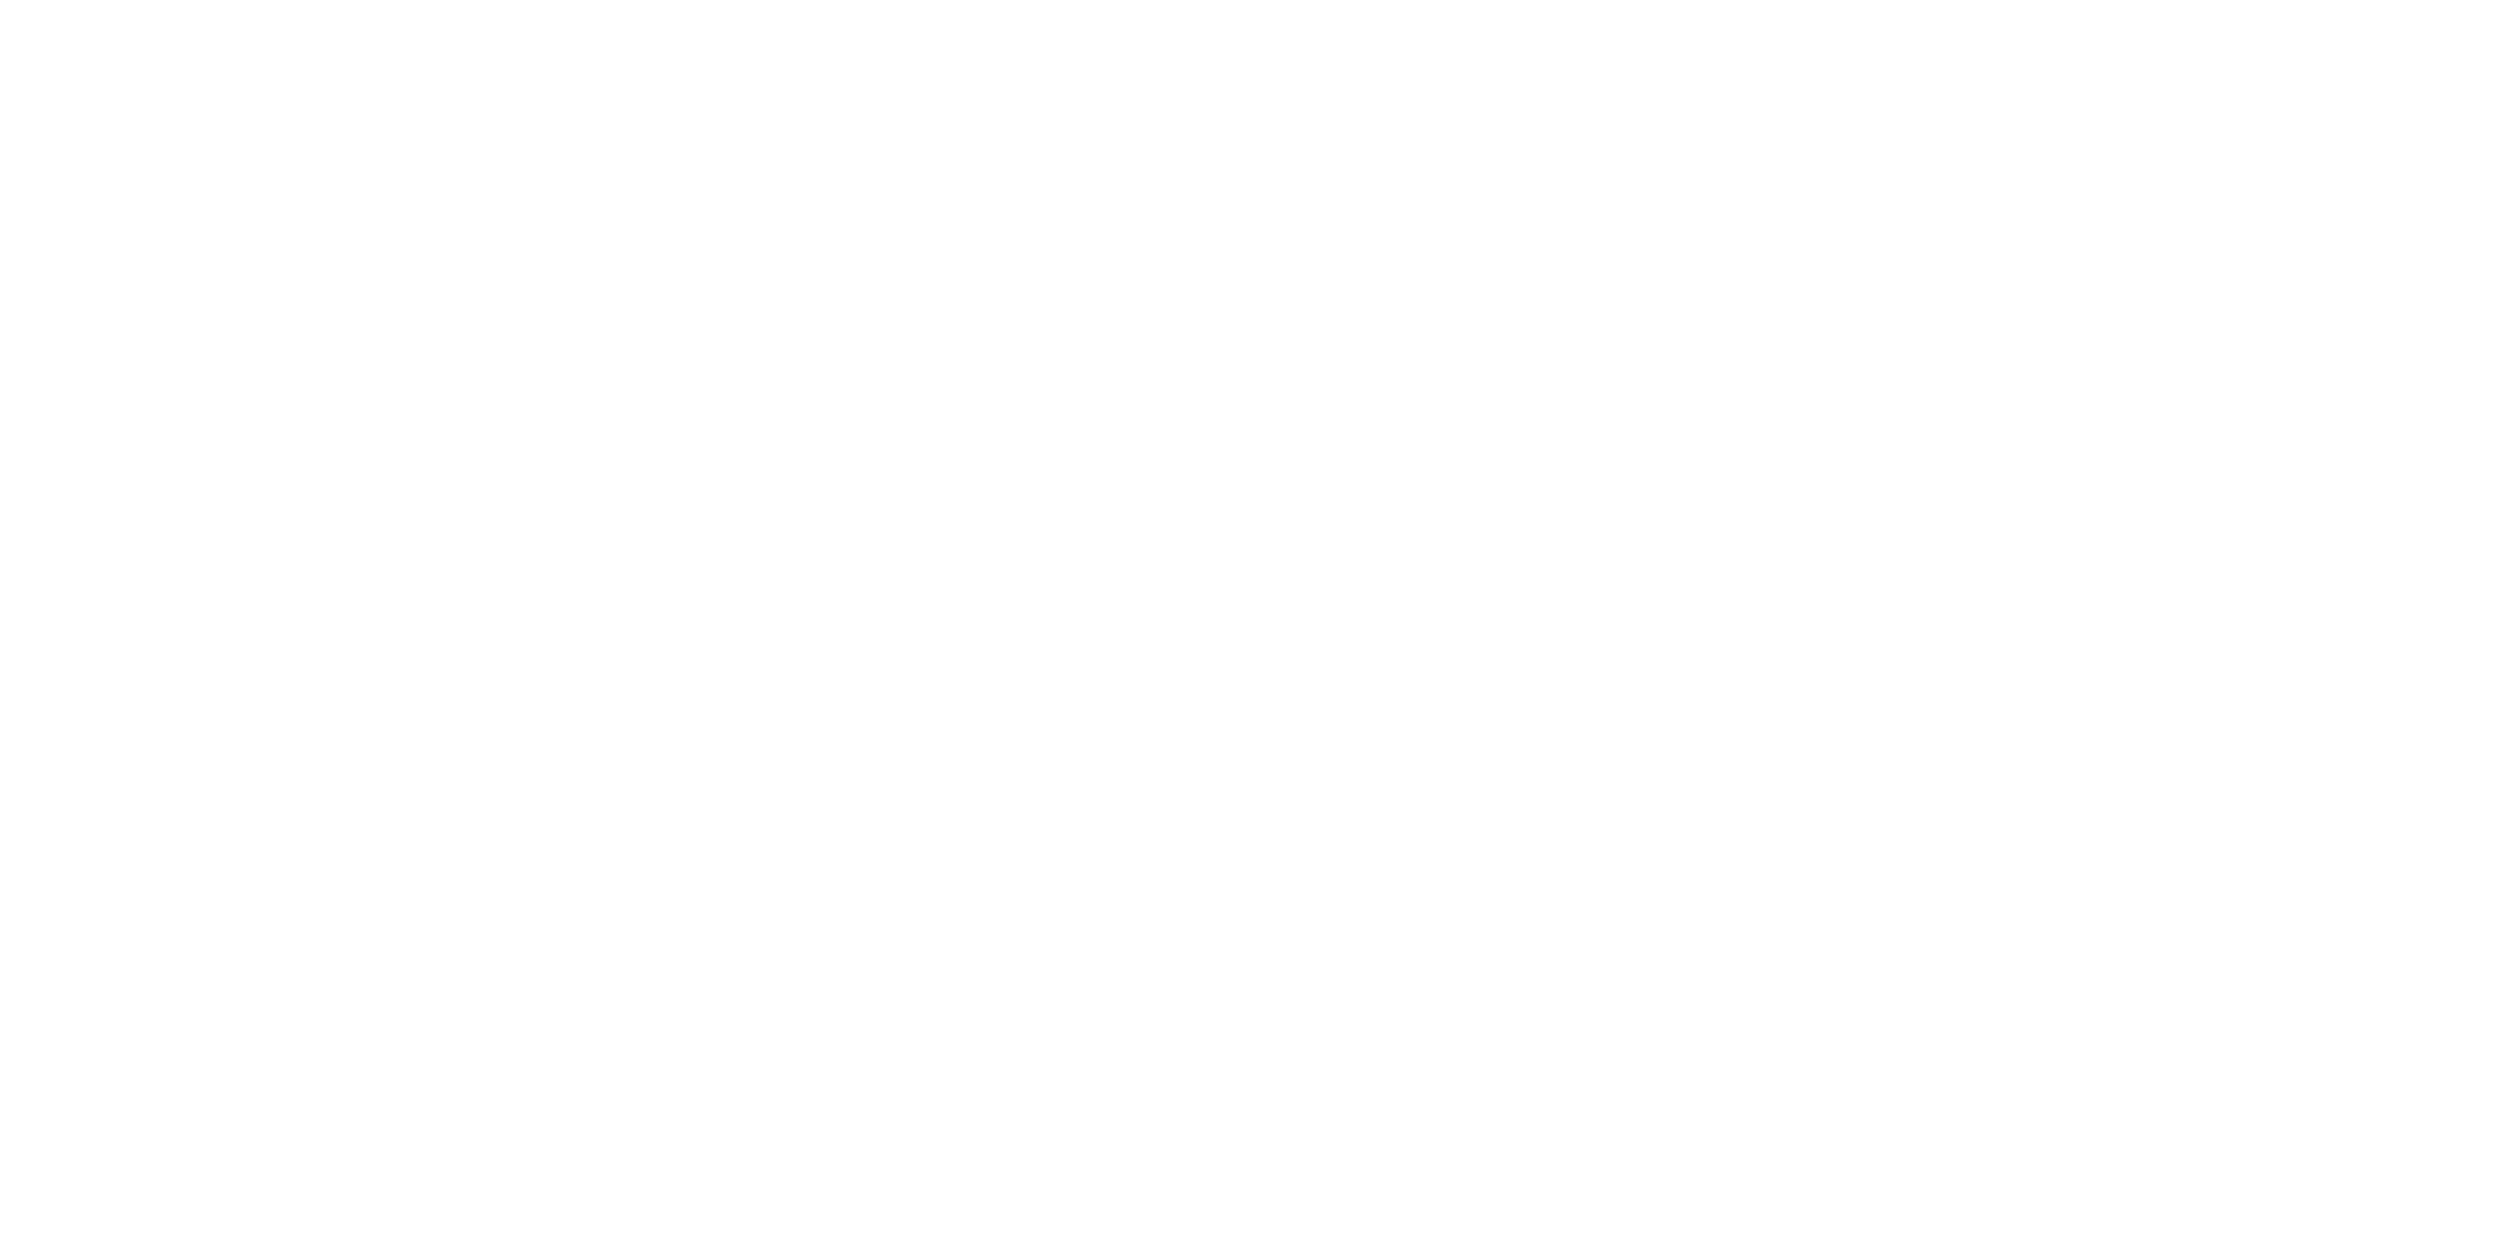 Co-Pilotes Communication